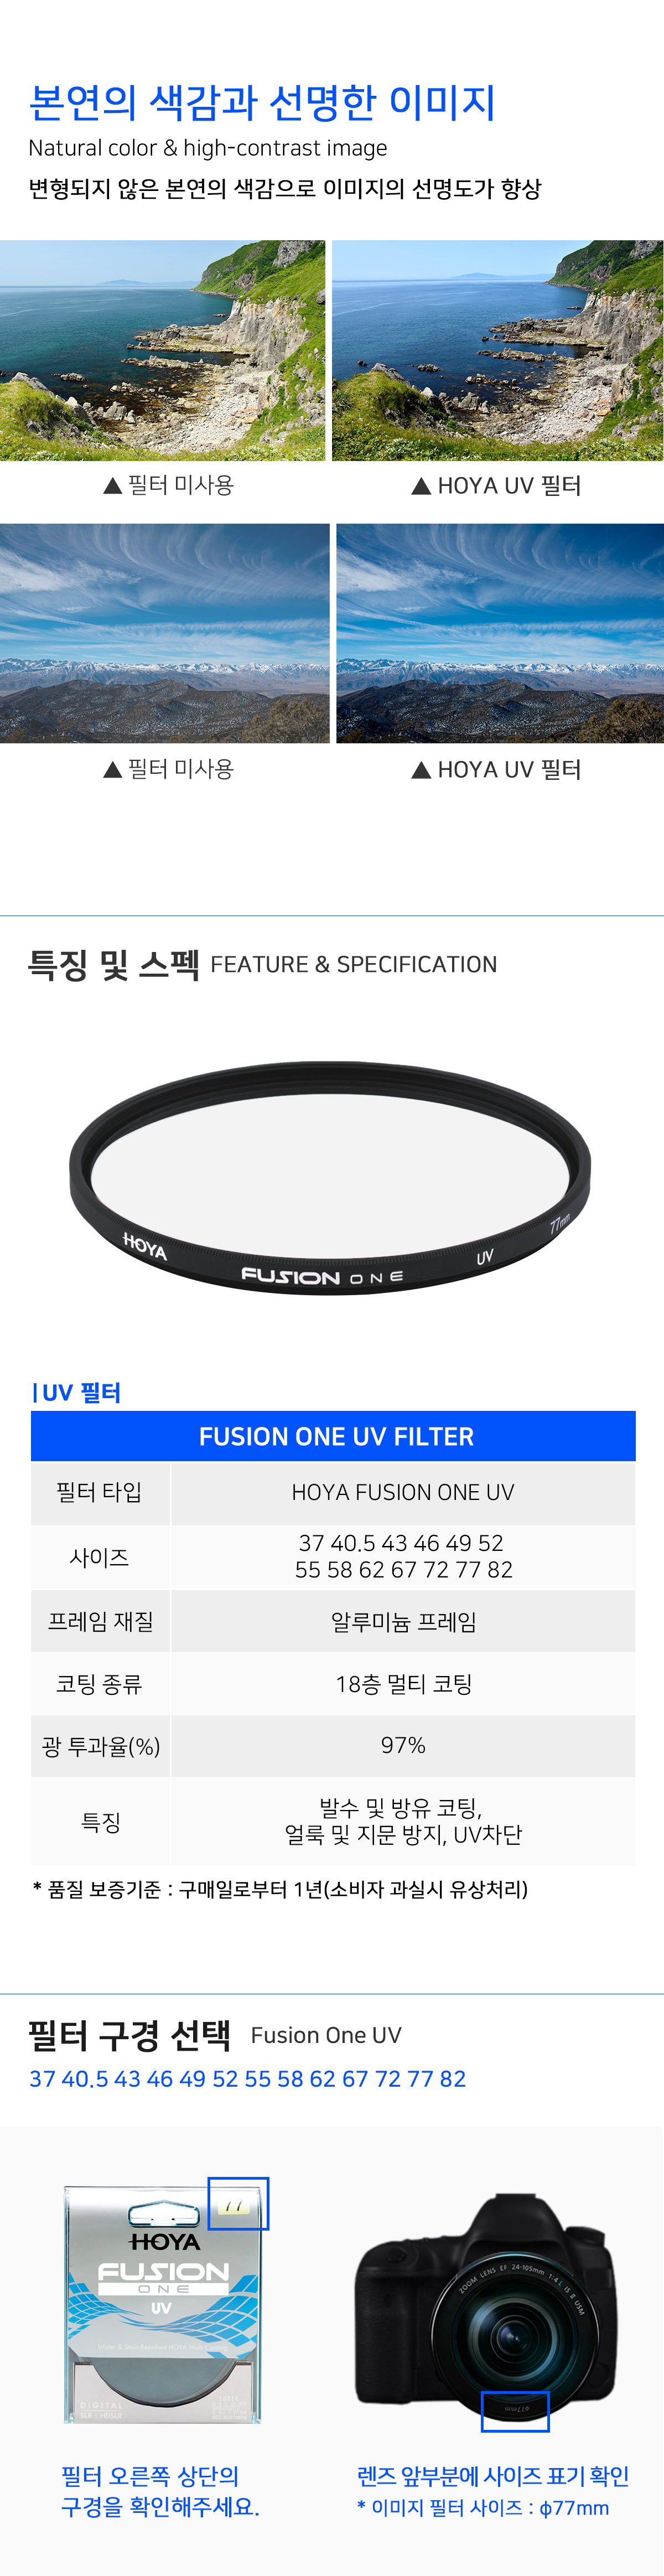 Fusion_One_UV_04.jpg